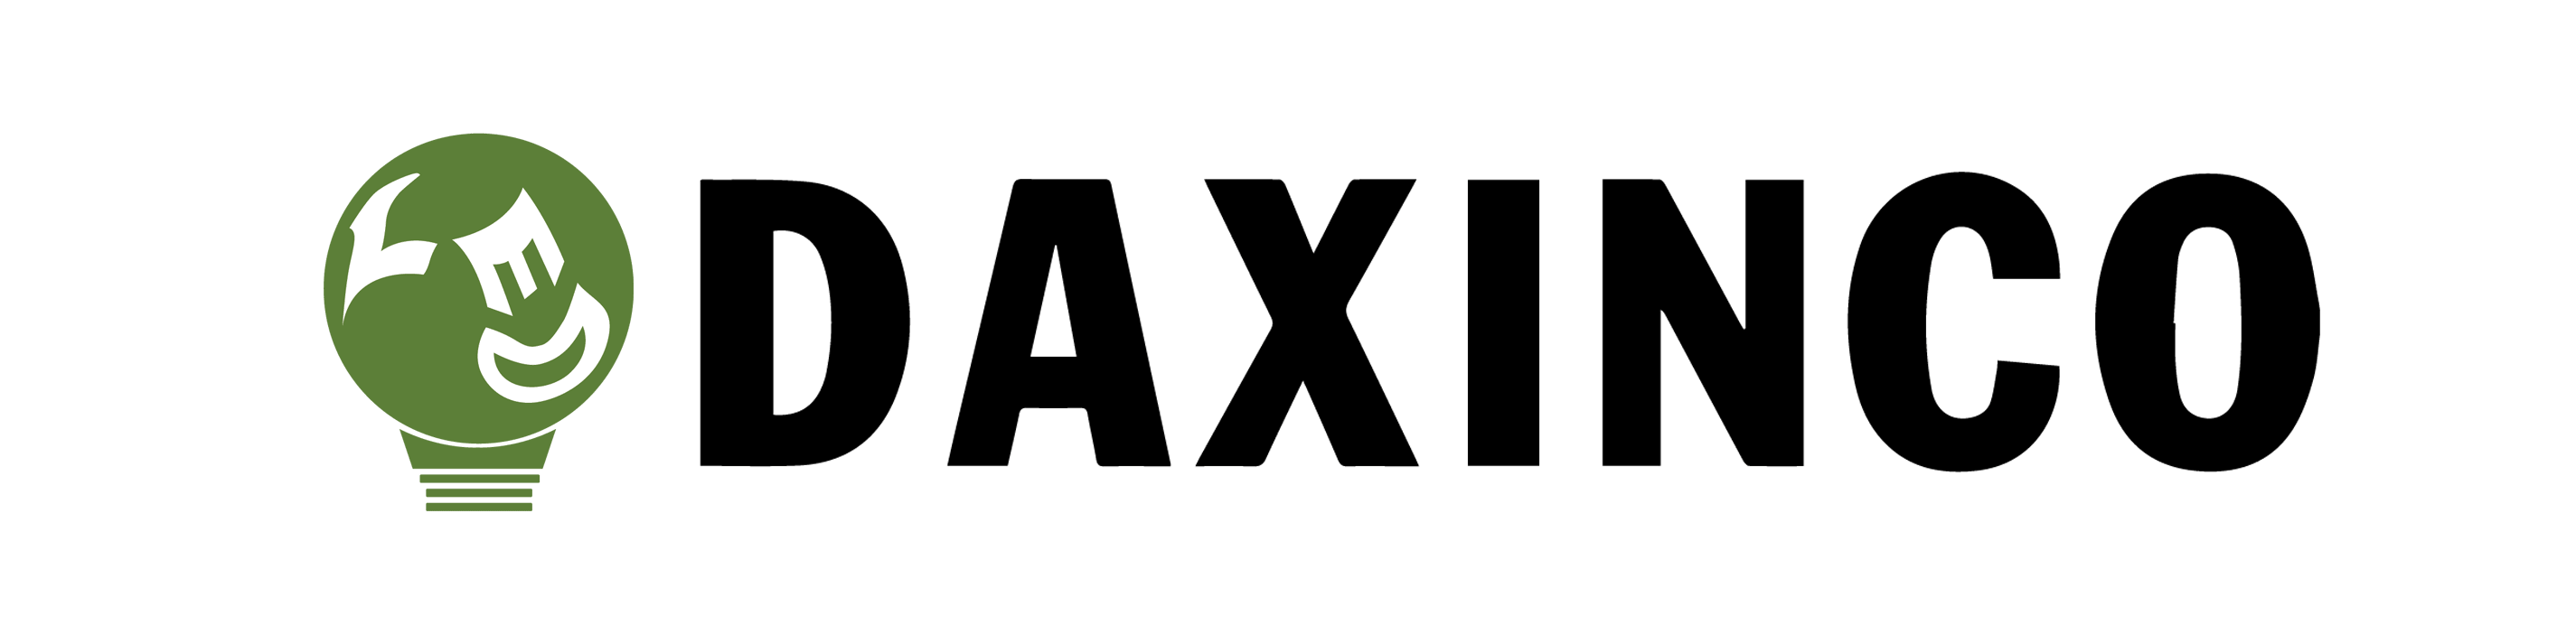 Đèn pha led DAXINCO